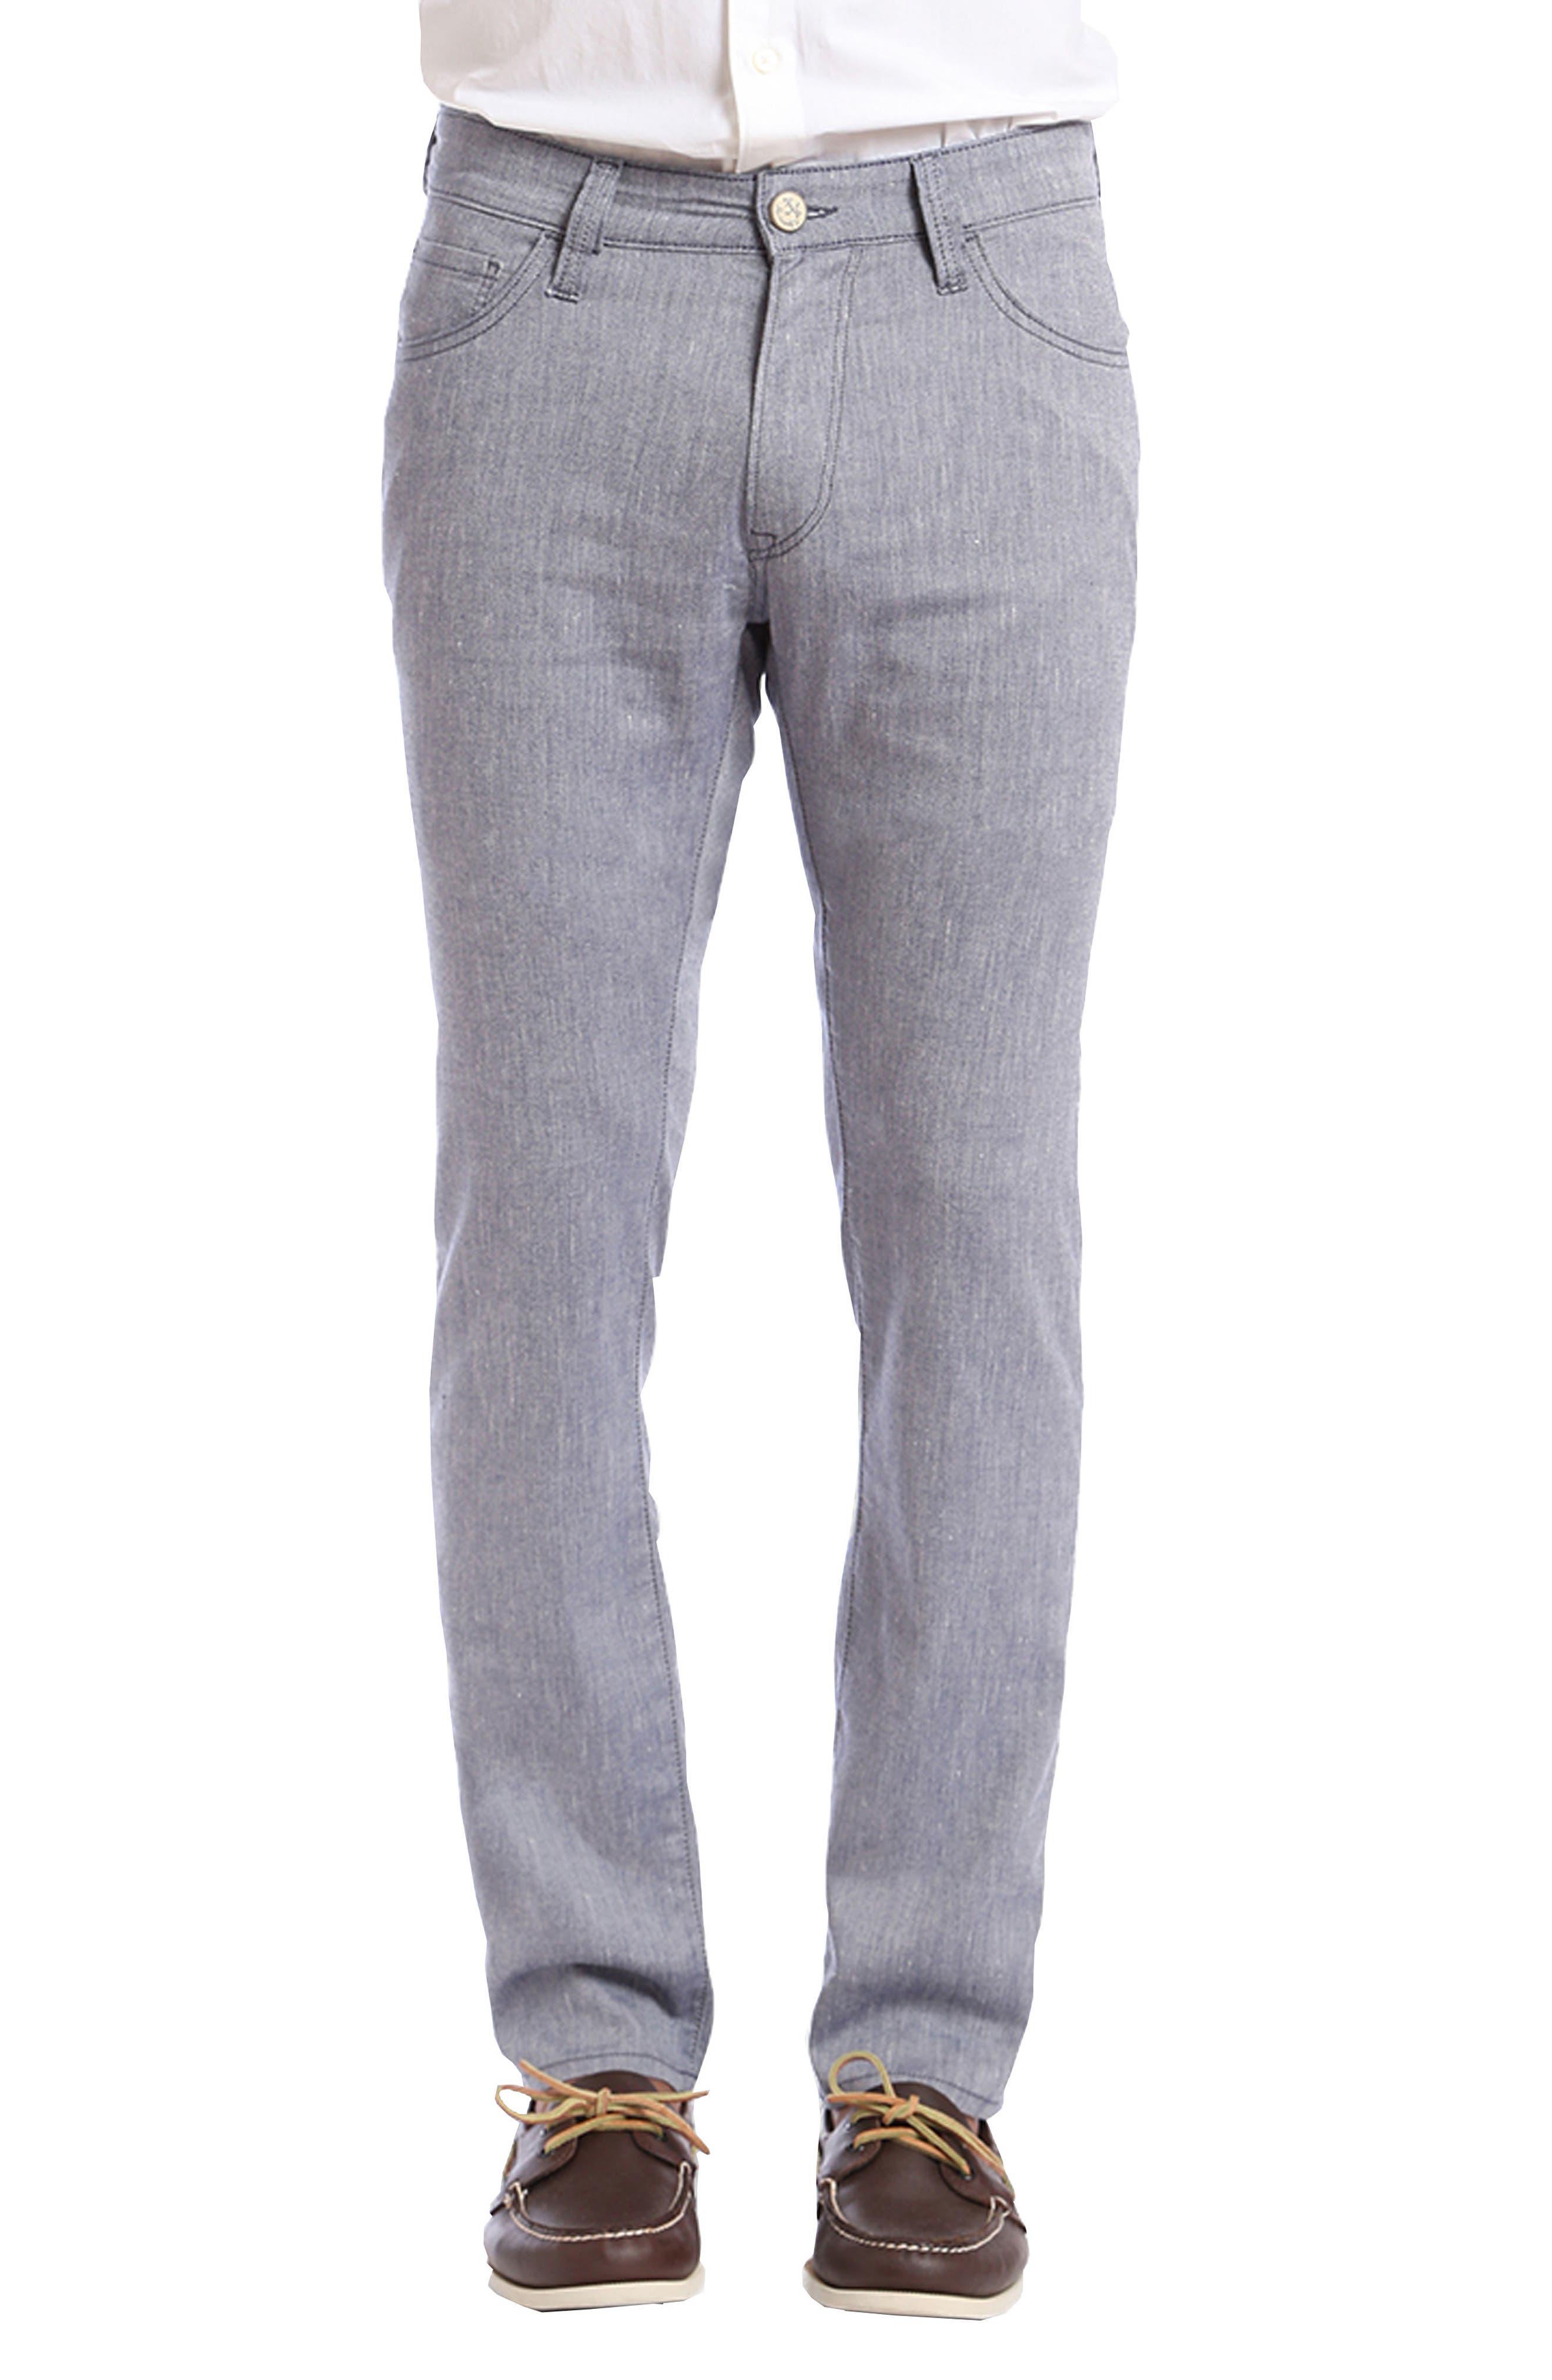 Courage Straight Leg Jeans,                         Main,                         color, Indigo Textured